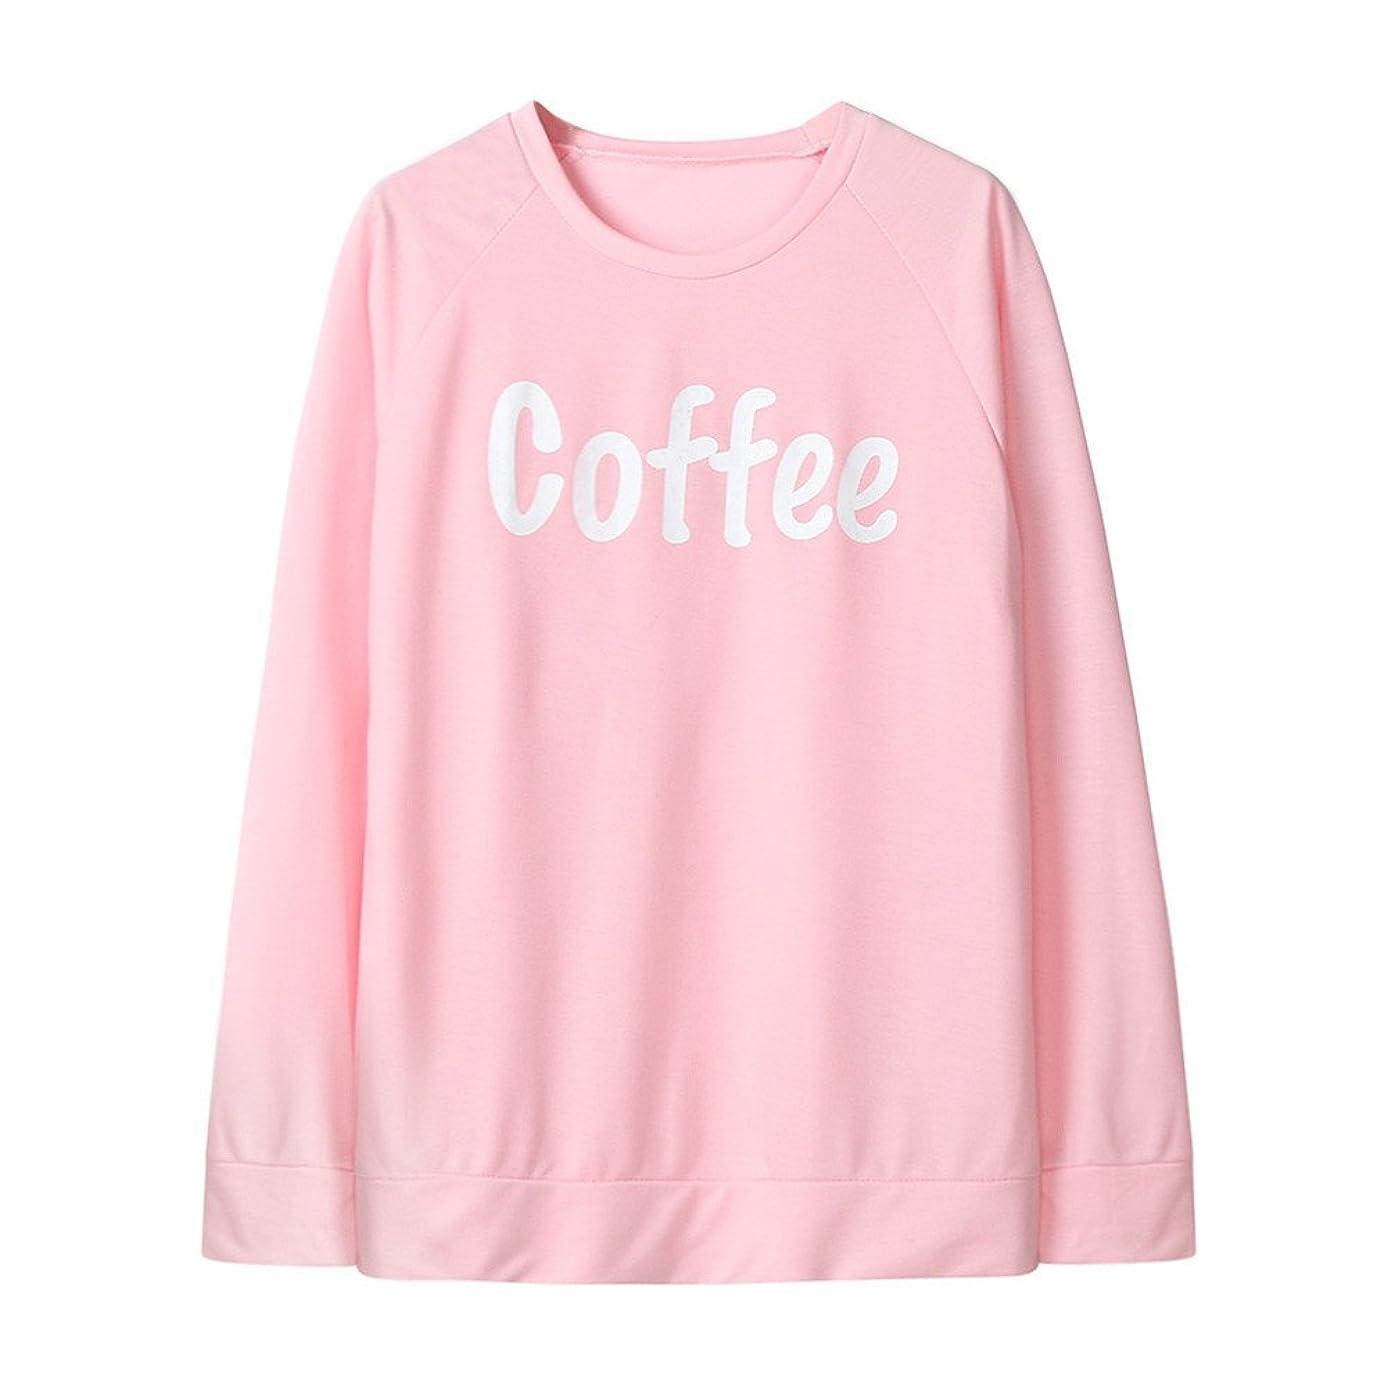 Hanican Mom & Me Women Baby Kid Girls Coffee Milk Print Sweatshirt Long Sleeve Tops Cute Family Matching Clothes